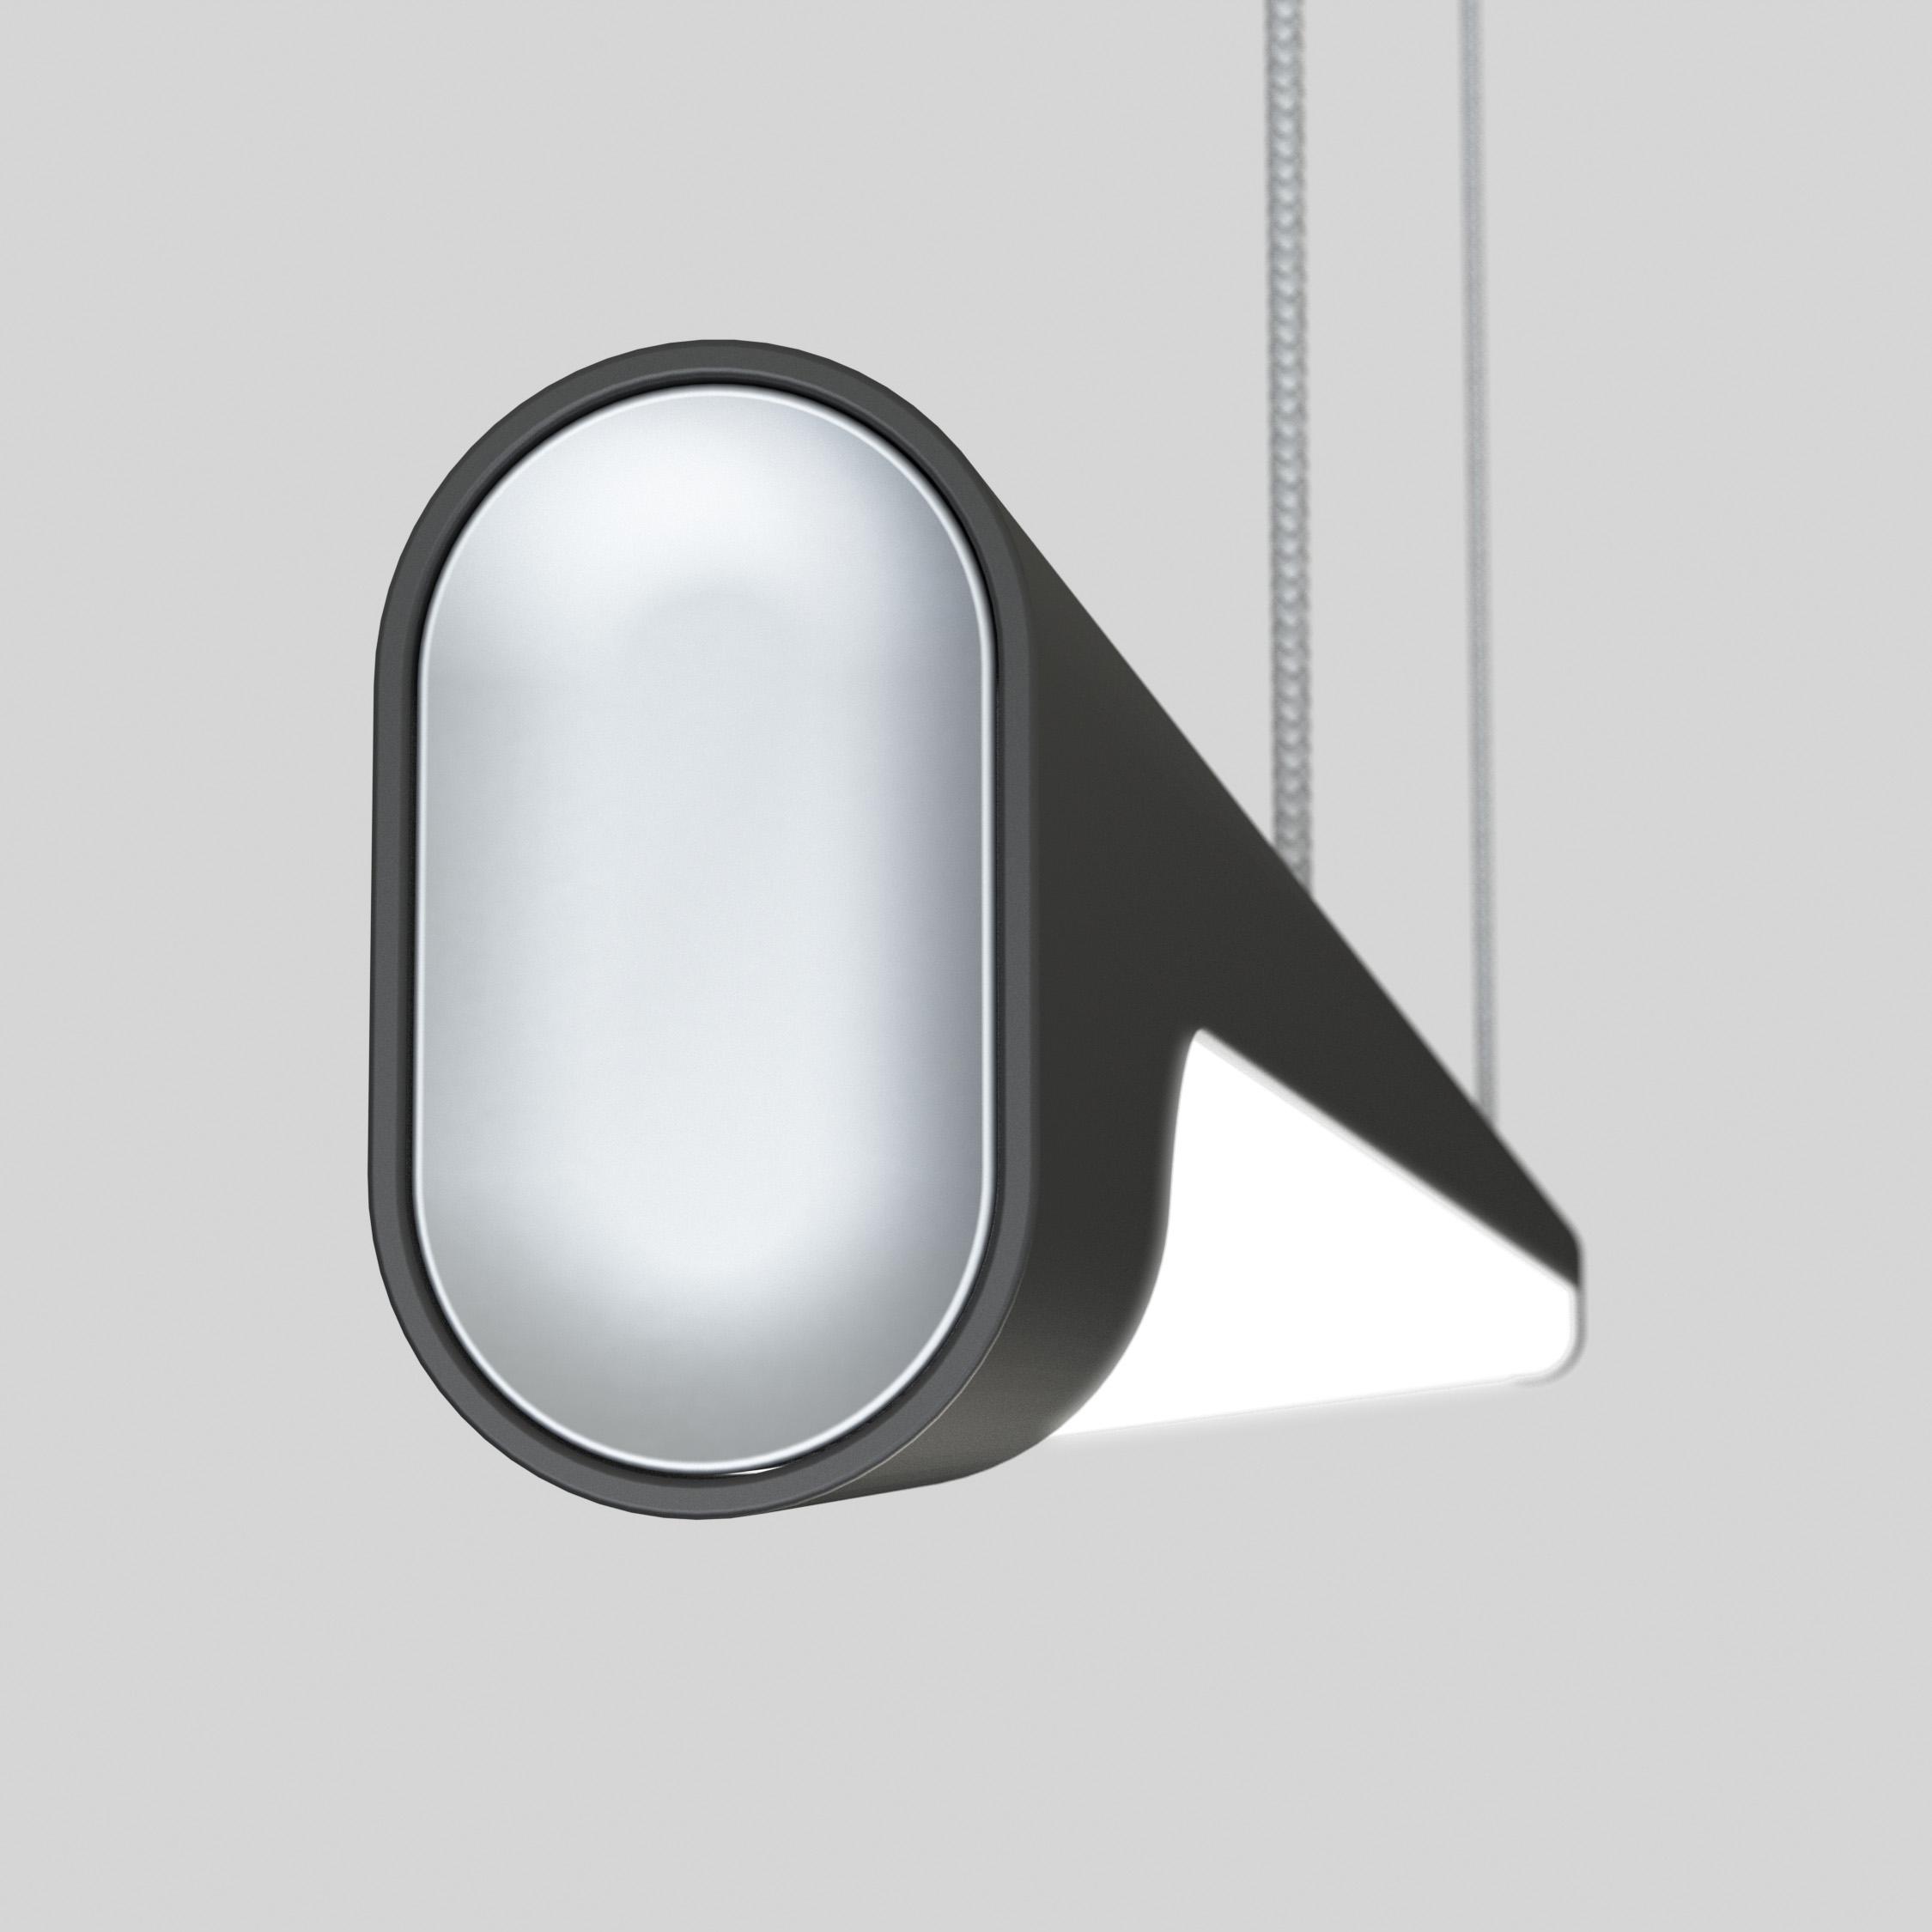 cor new product image